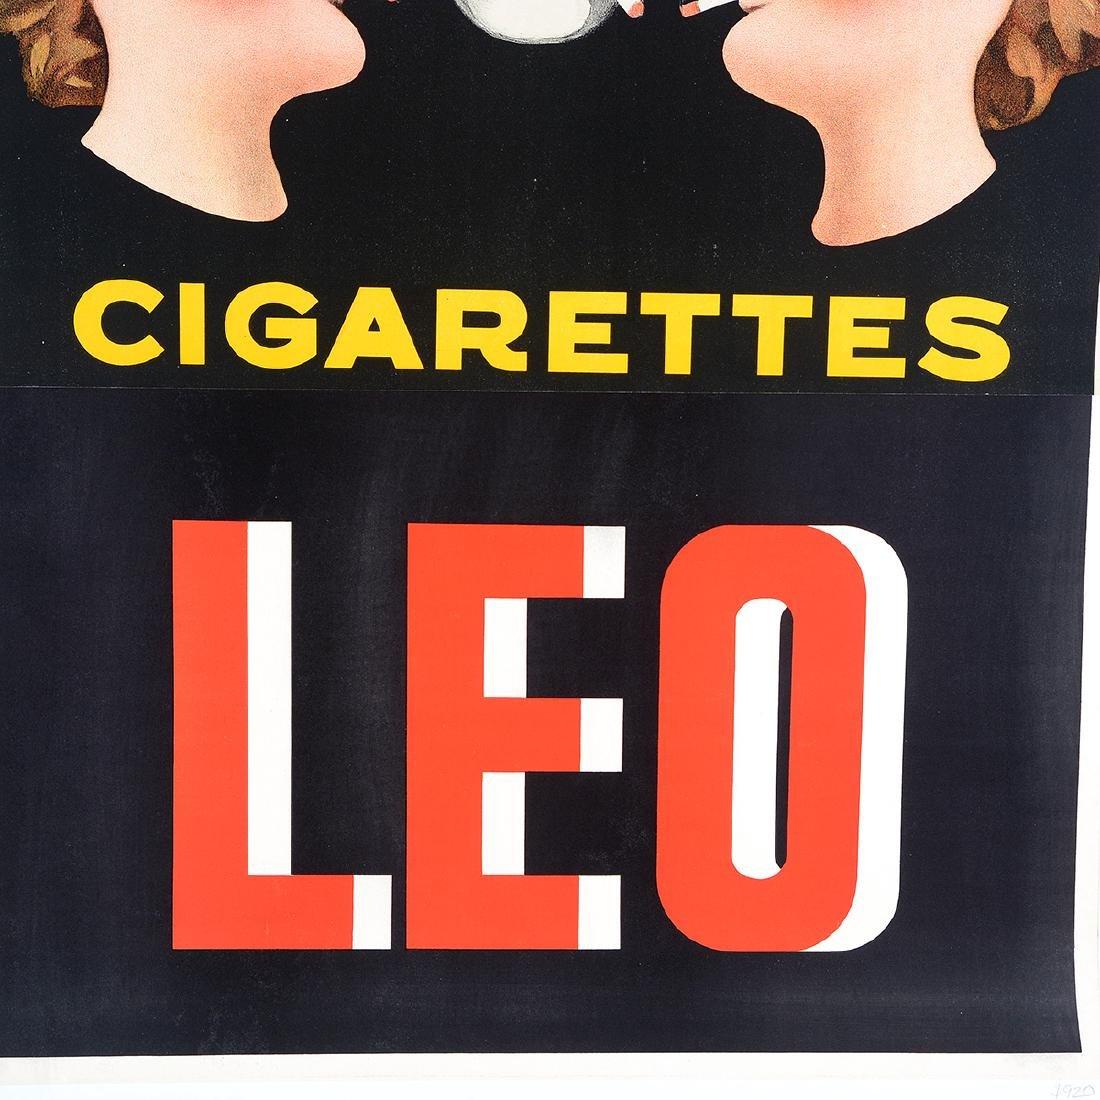 European lithograph posters Circus Stock & Cig. Leo - 8